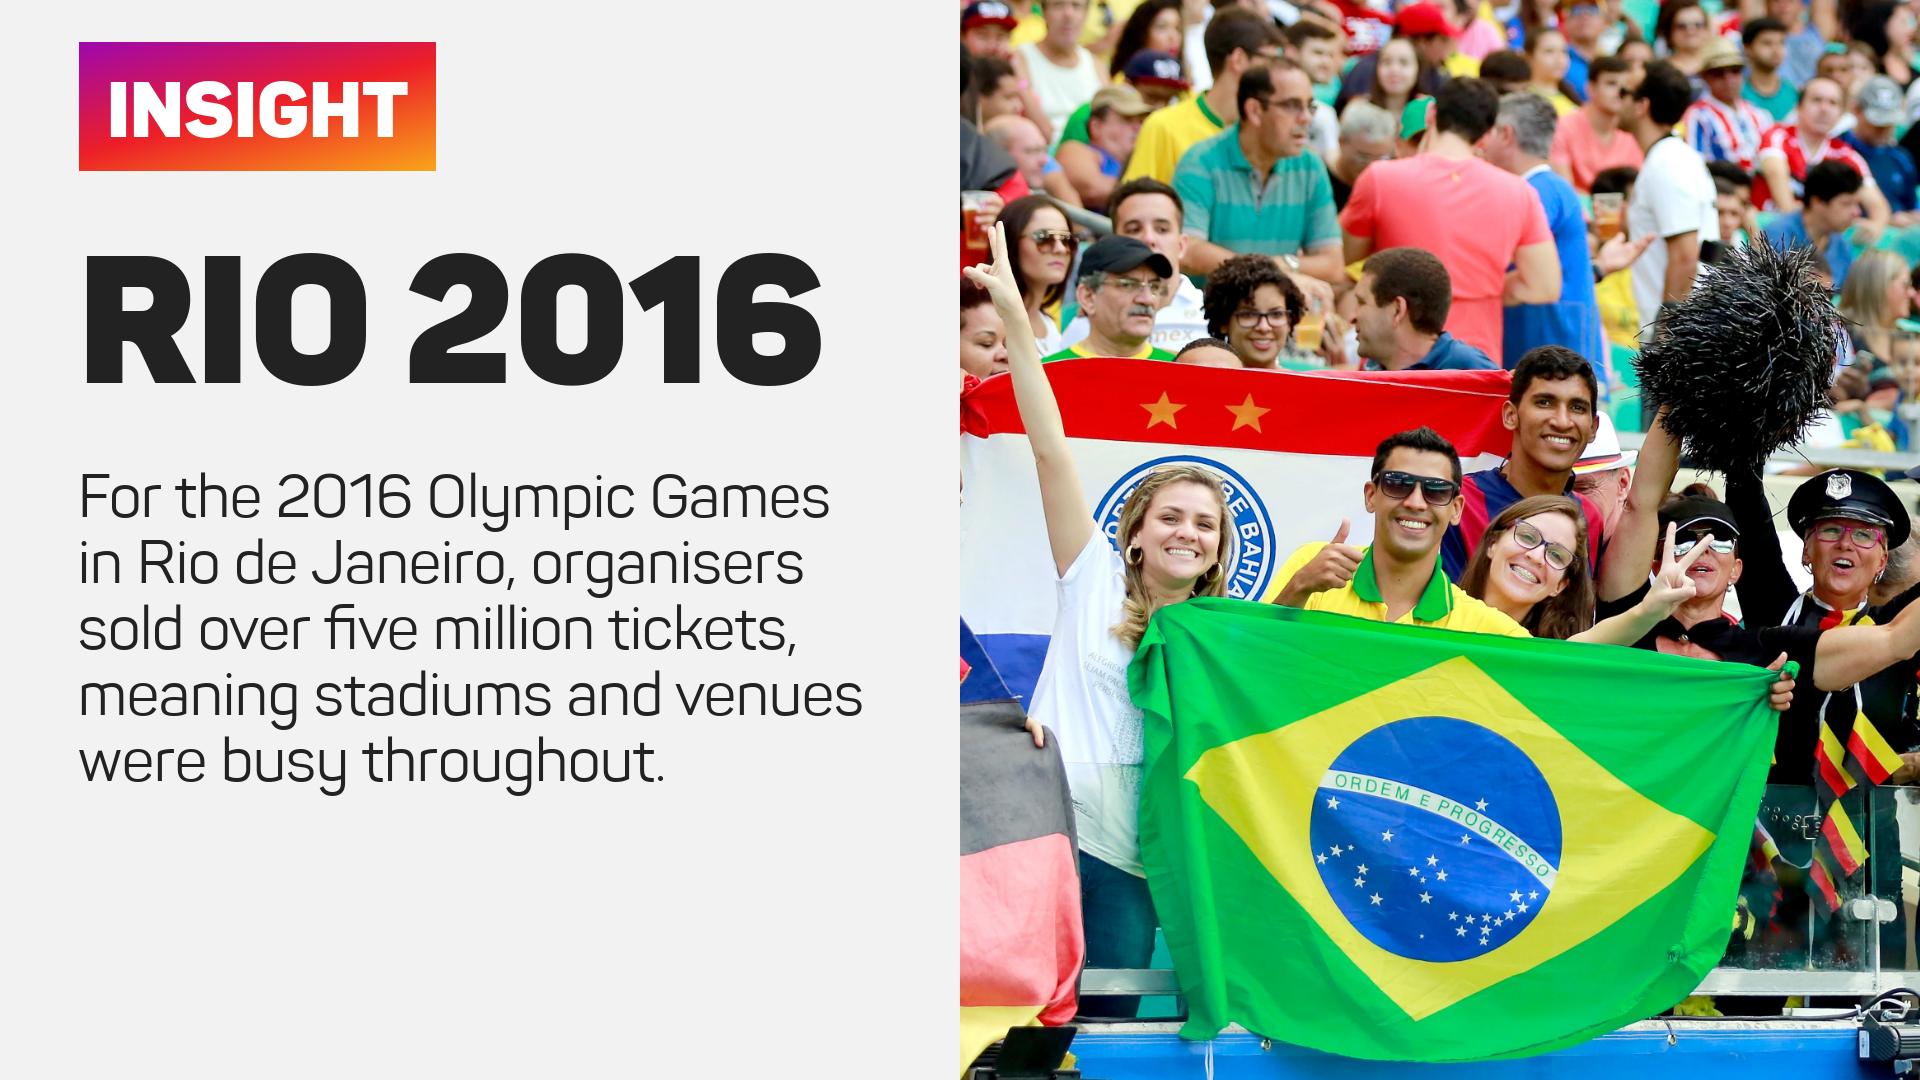 Olympic Games spectators